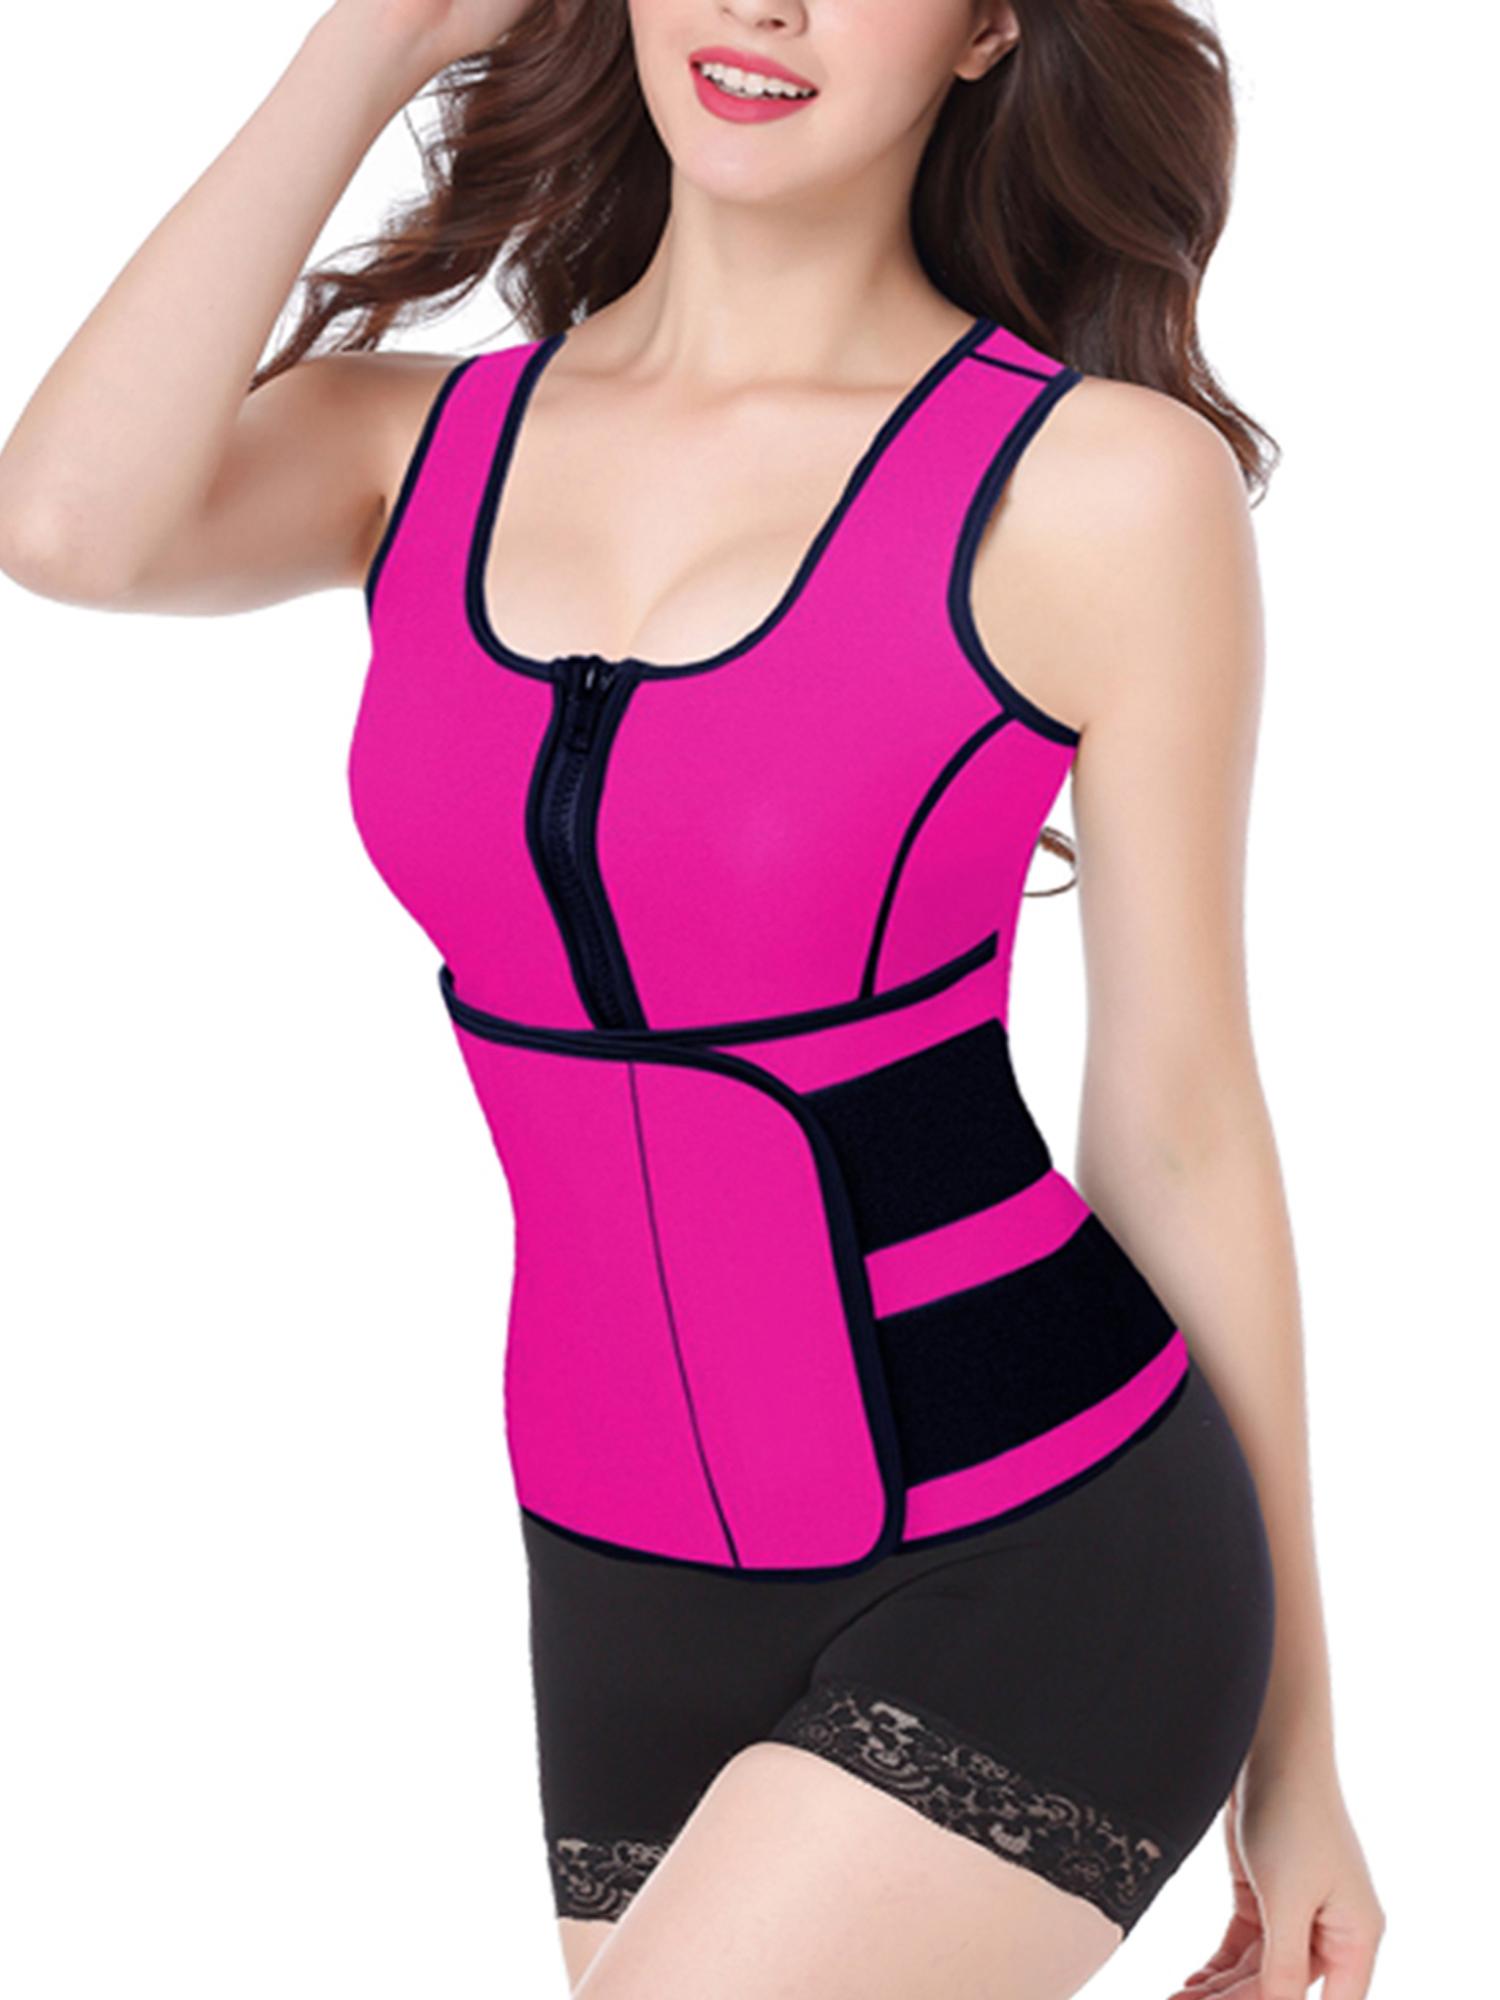 Neoprene Belt Tummy Control Body Shapers Slimming Sweat Vest Firm Control Adjustable Waist Trimmer Belt Vest Figure Slimmer